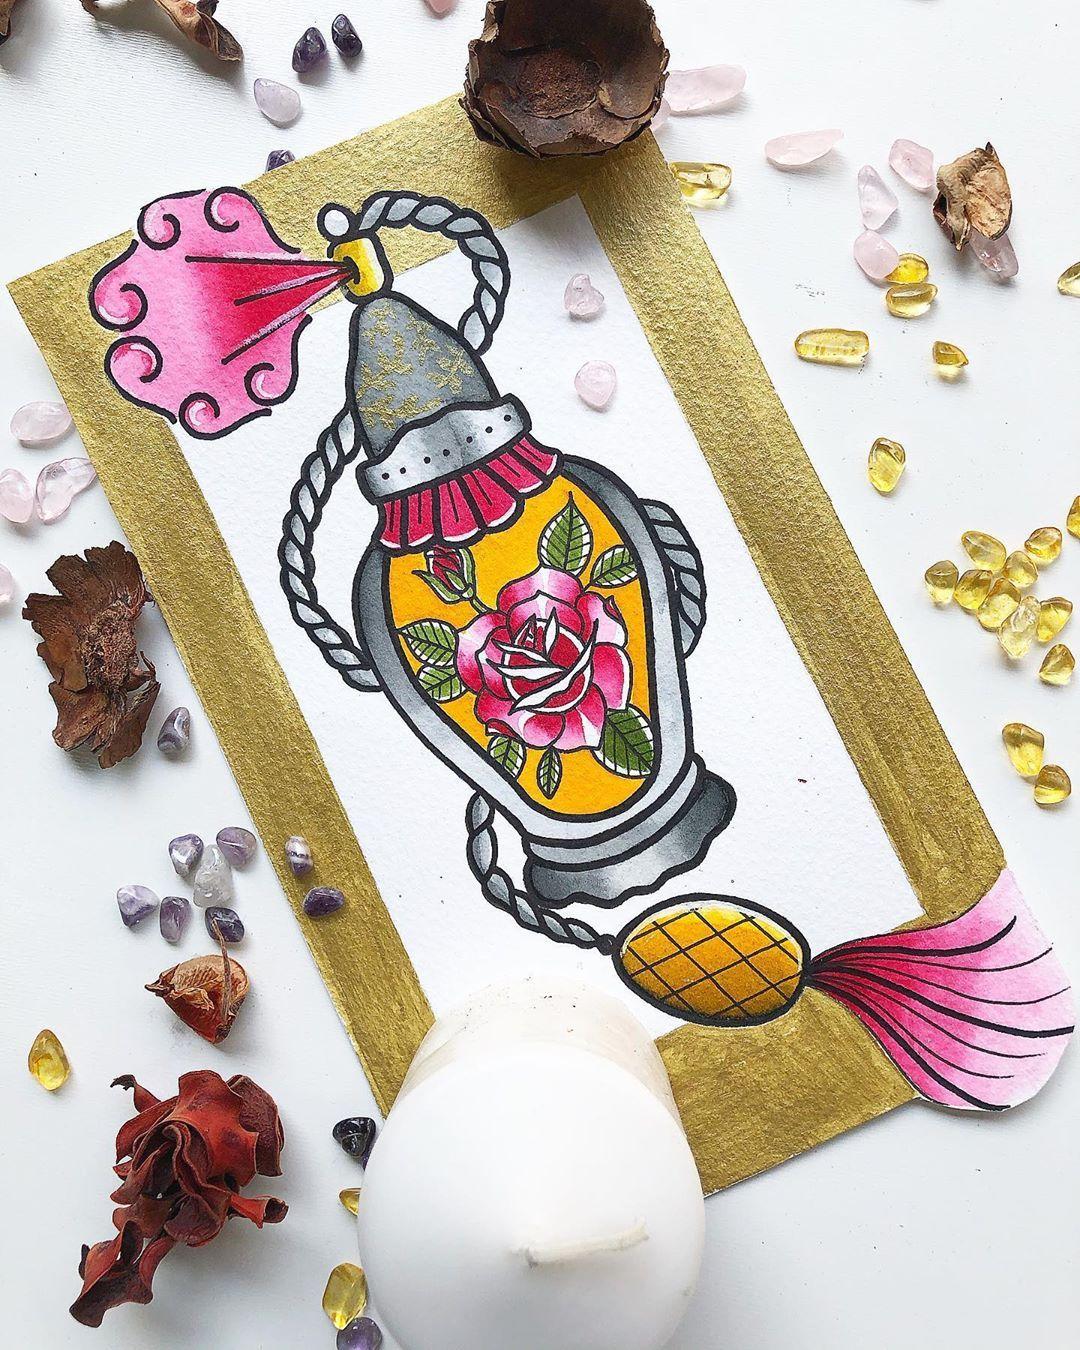 FELIZ COMIENZO DE SEMANA!!!! Quieres tu tattoo nuevo!?? ESCRÍBEME y cuéntame tu idea!  #tatuaje #tattoo #ink #inked #tattoos #tattooed #tatuajes #tattooartist #art #tattooart #spain #tattoolife #inkedup #tattooing #tattooist #madrid #inkaddict #tattoodesign #españa #inklife #spaintattoo #blackwork #barcelonatattoo #tattooink #arte #inkstagram #love #tattoolove #instatattoo